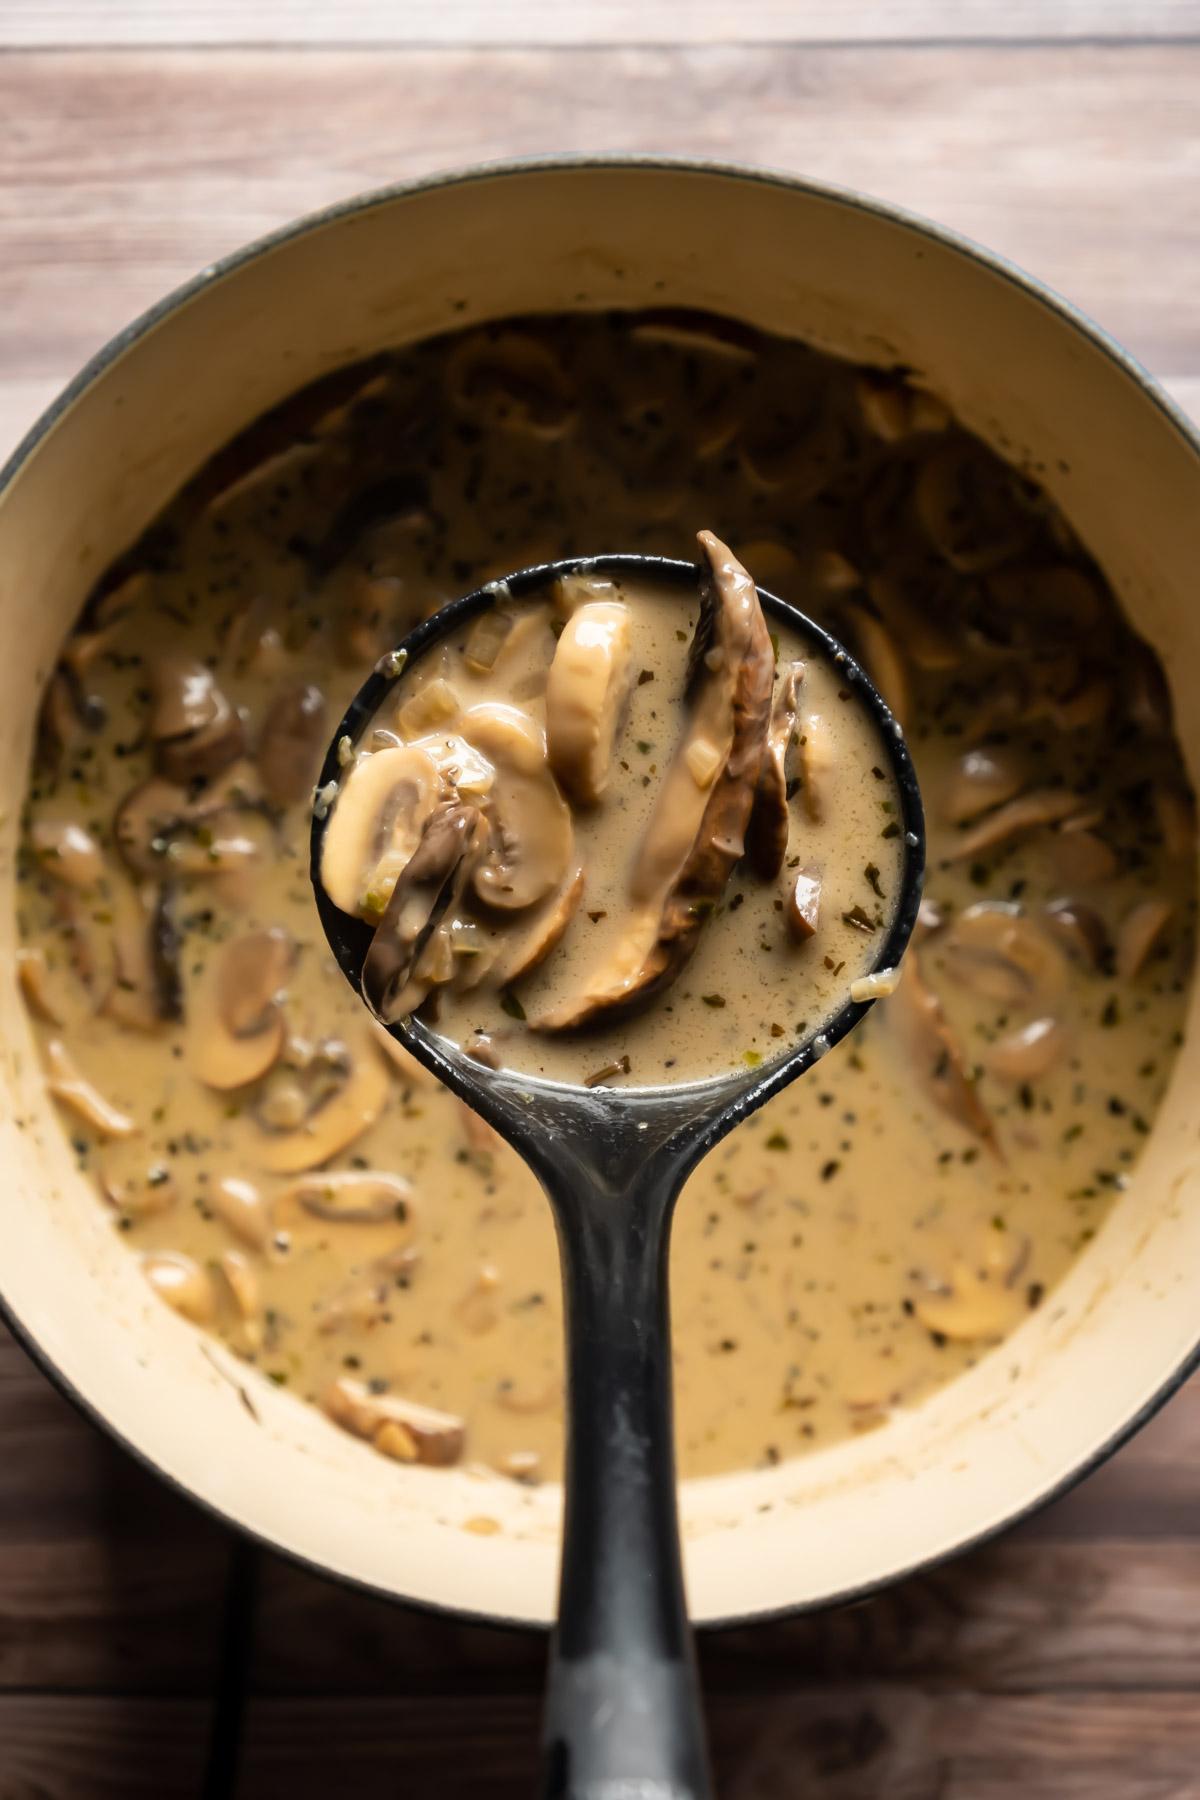 A soup ladle full of soup above a pot of vegan mushroom soup.